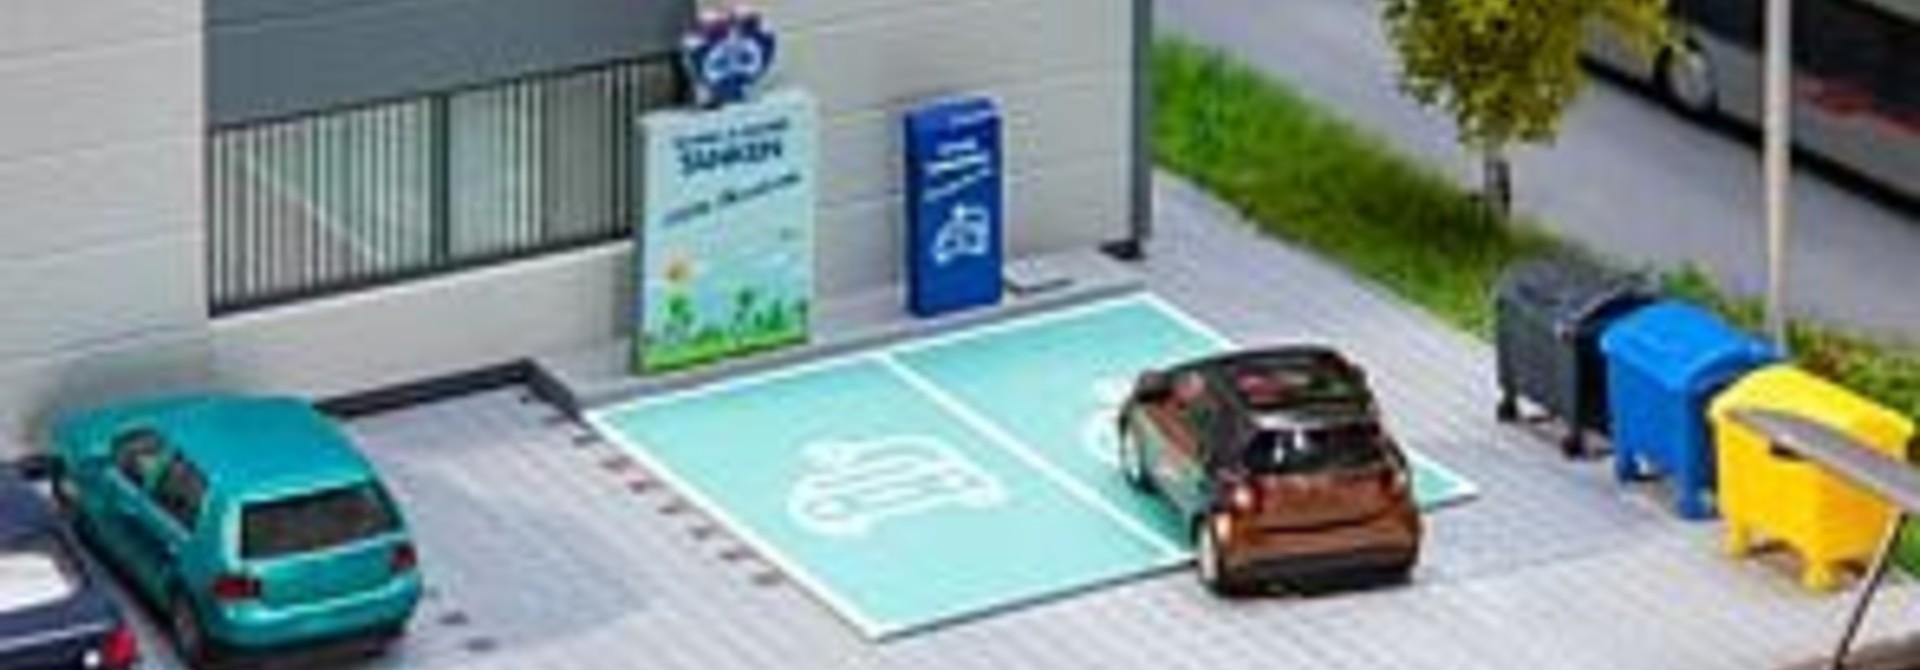 180280 Ladestation für E-Fahrzeuge